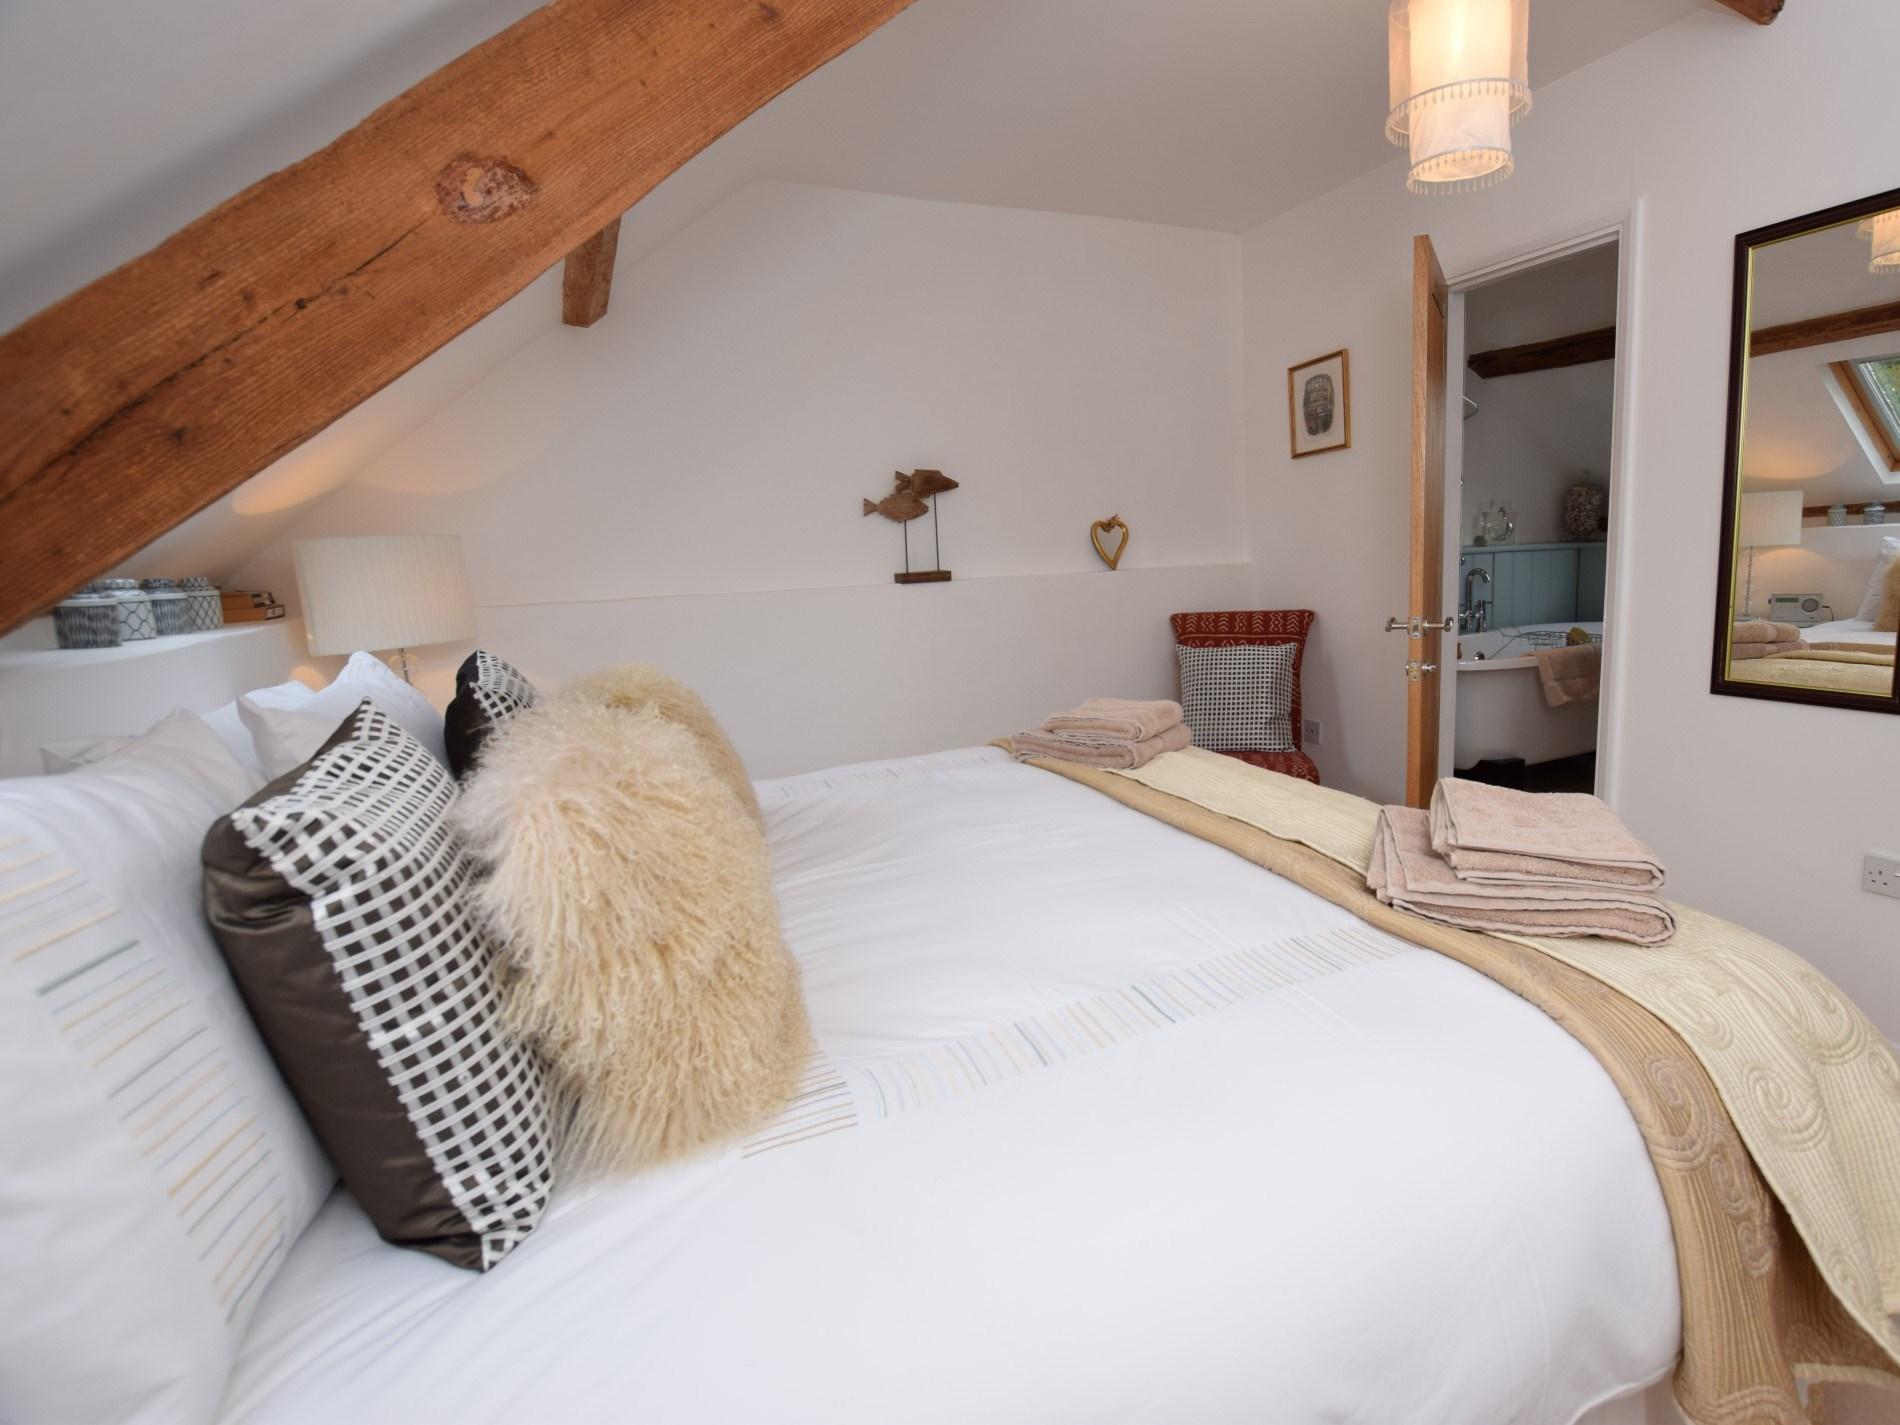 3 Bedroom Cottage in South Molton, Devon